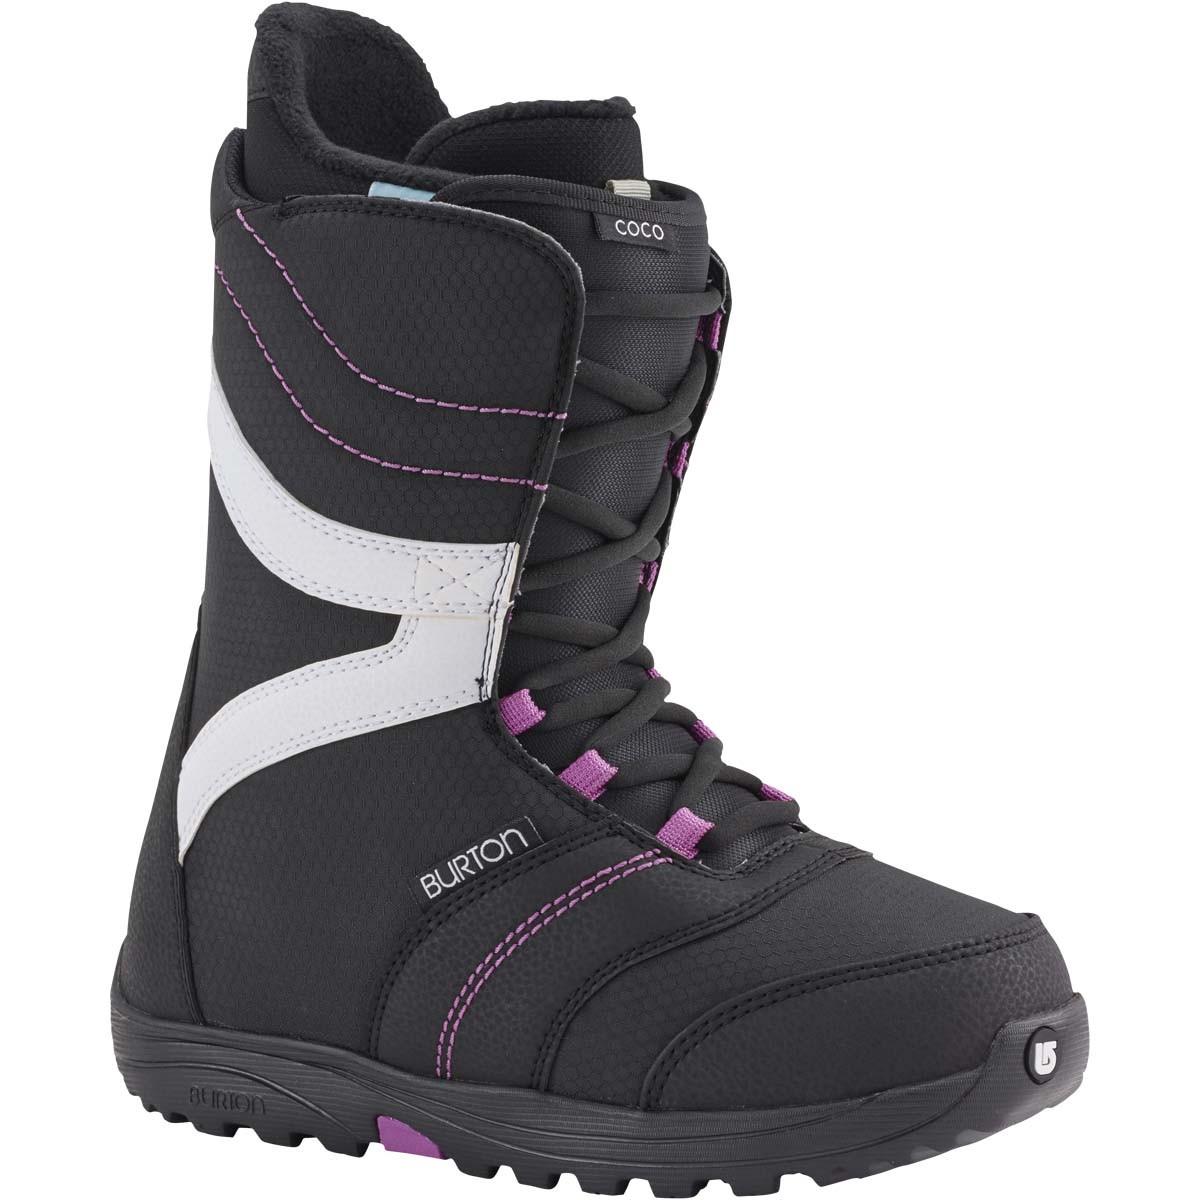 0a36a42871a1 Женские сноубордические ботинки - Траектория